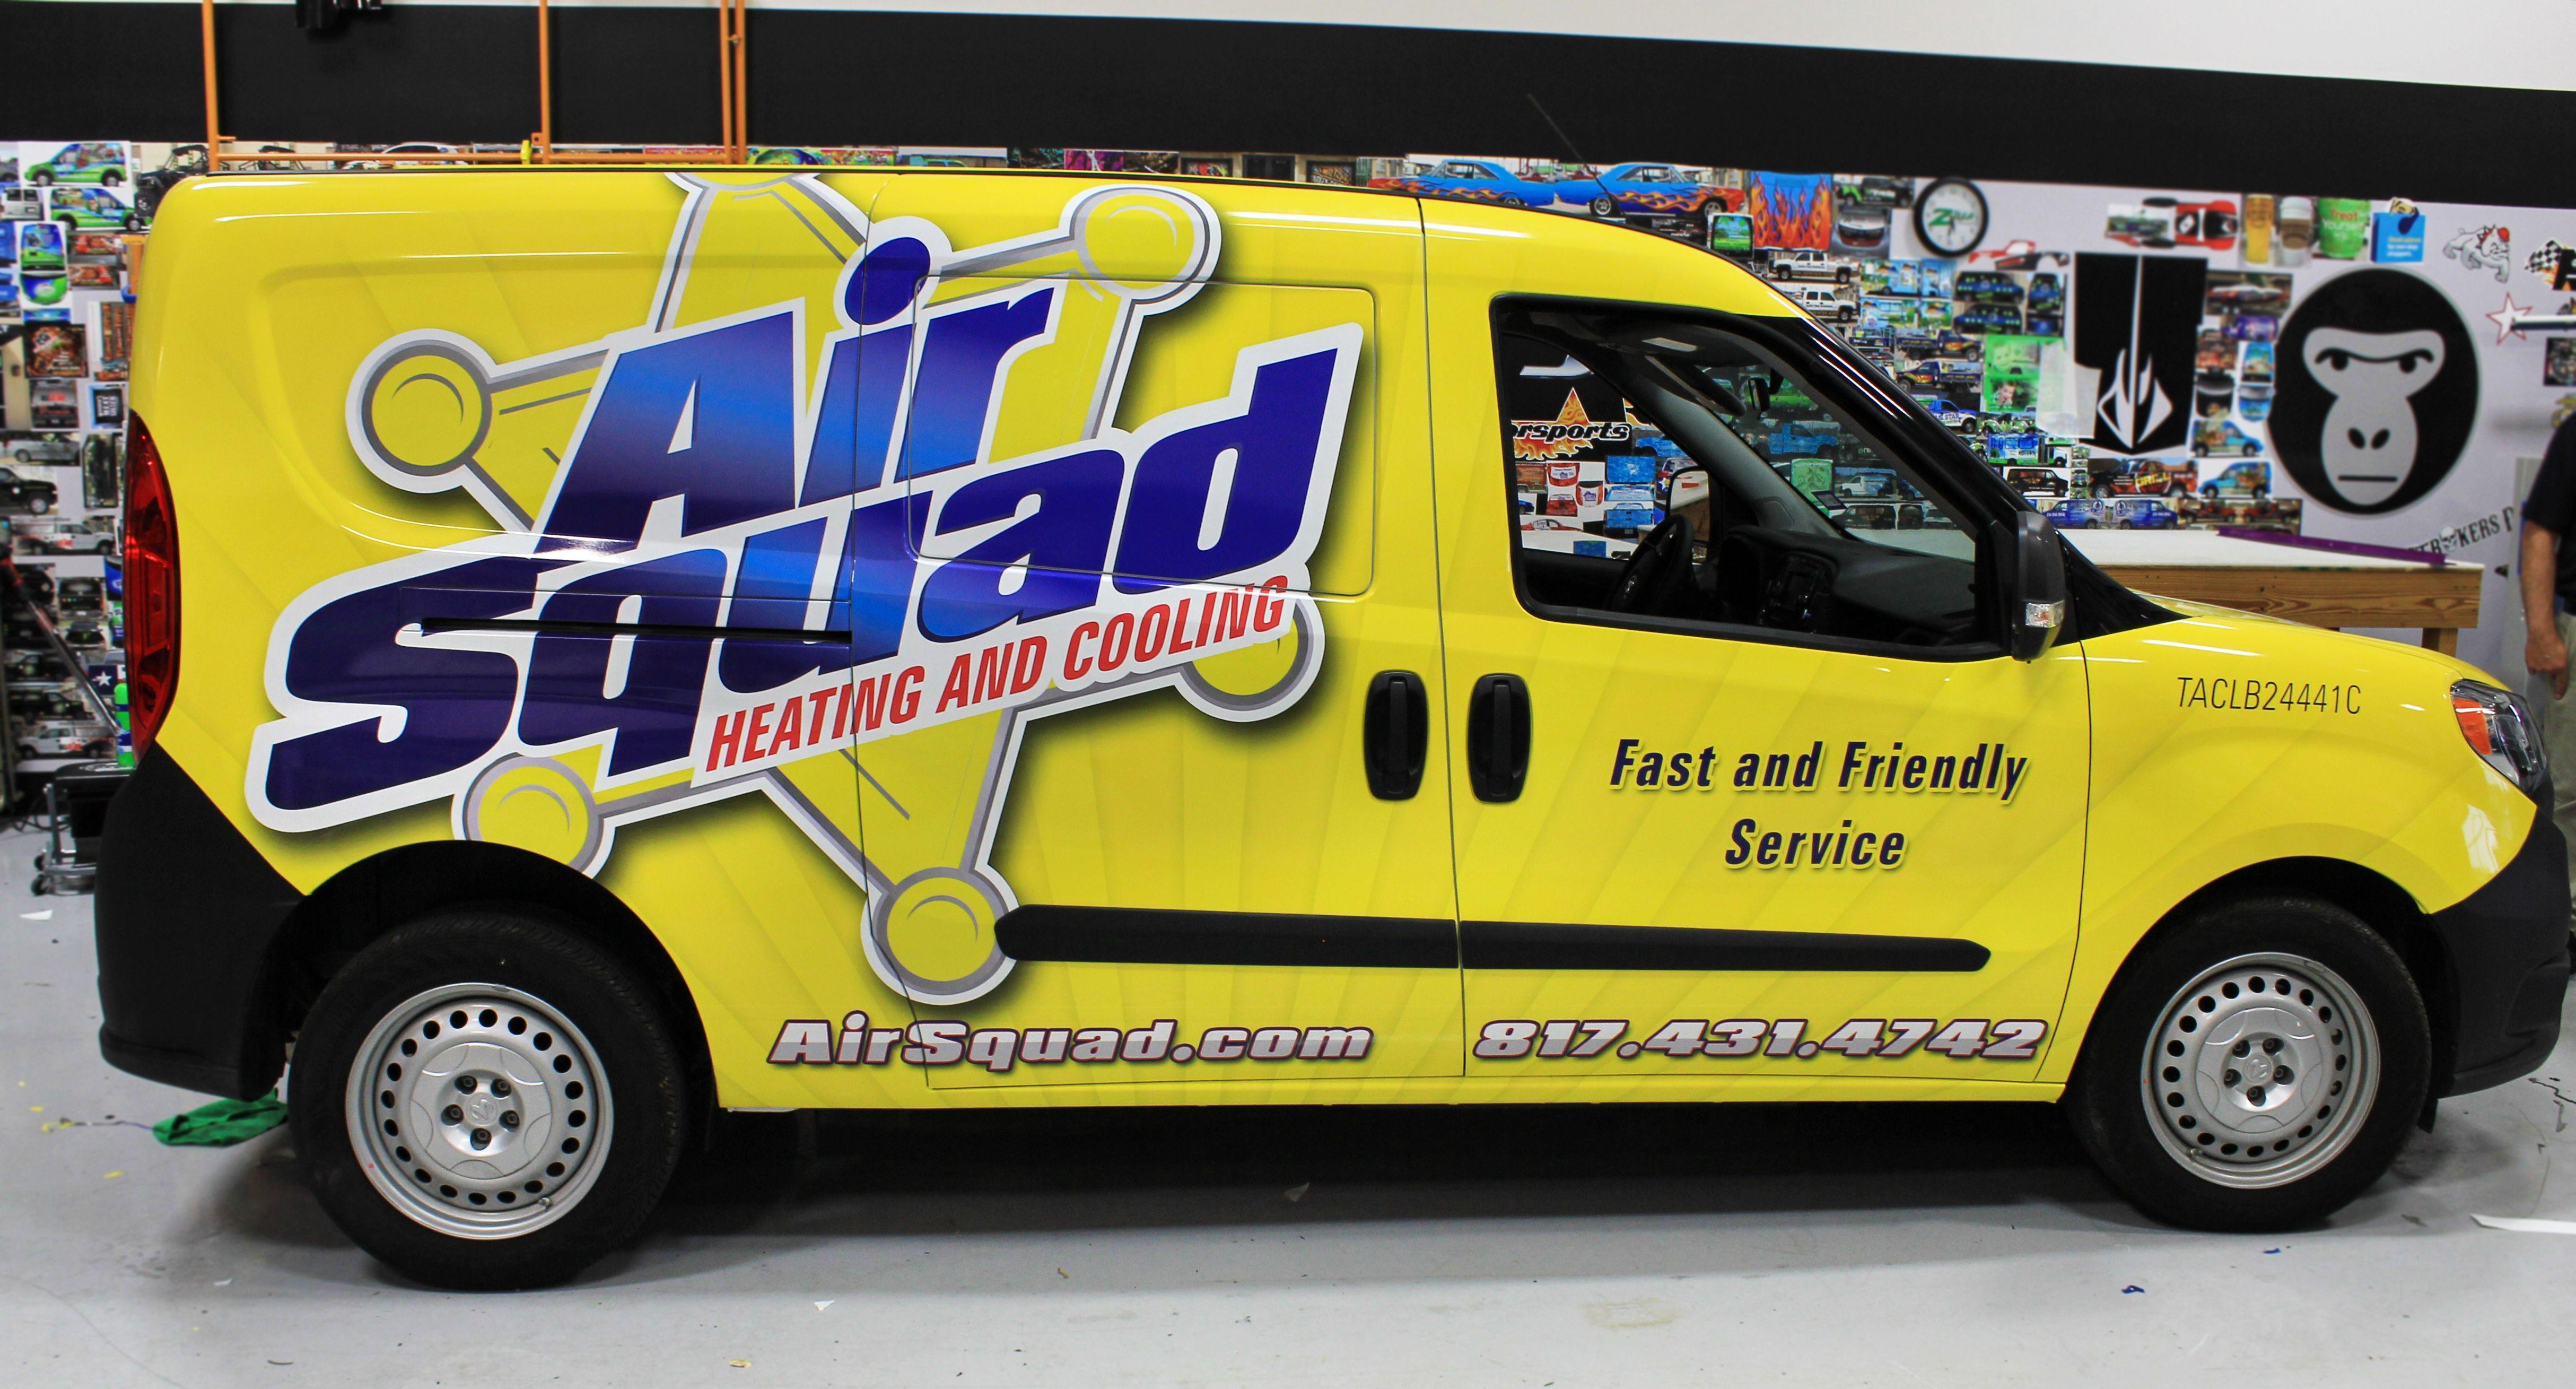 Air Conditioning van ideas   Advertising Vehicle Wraps   Pinterest ...